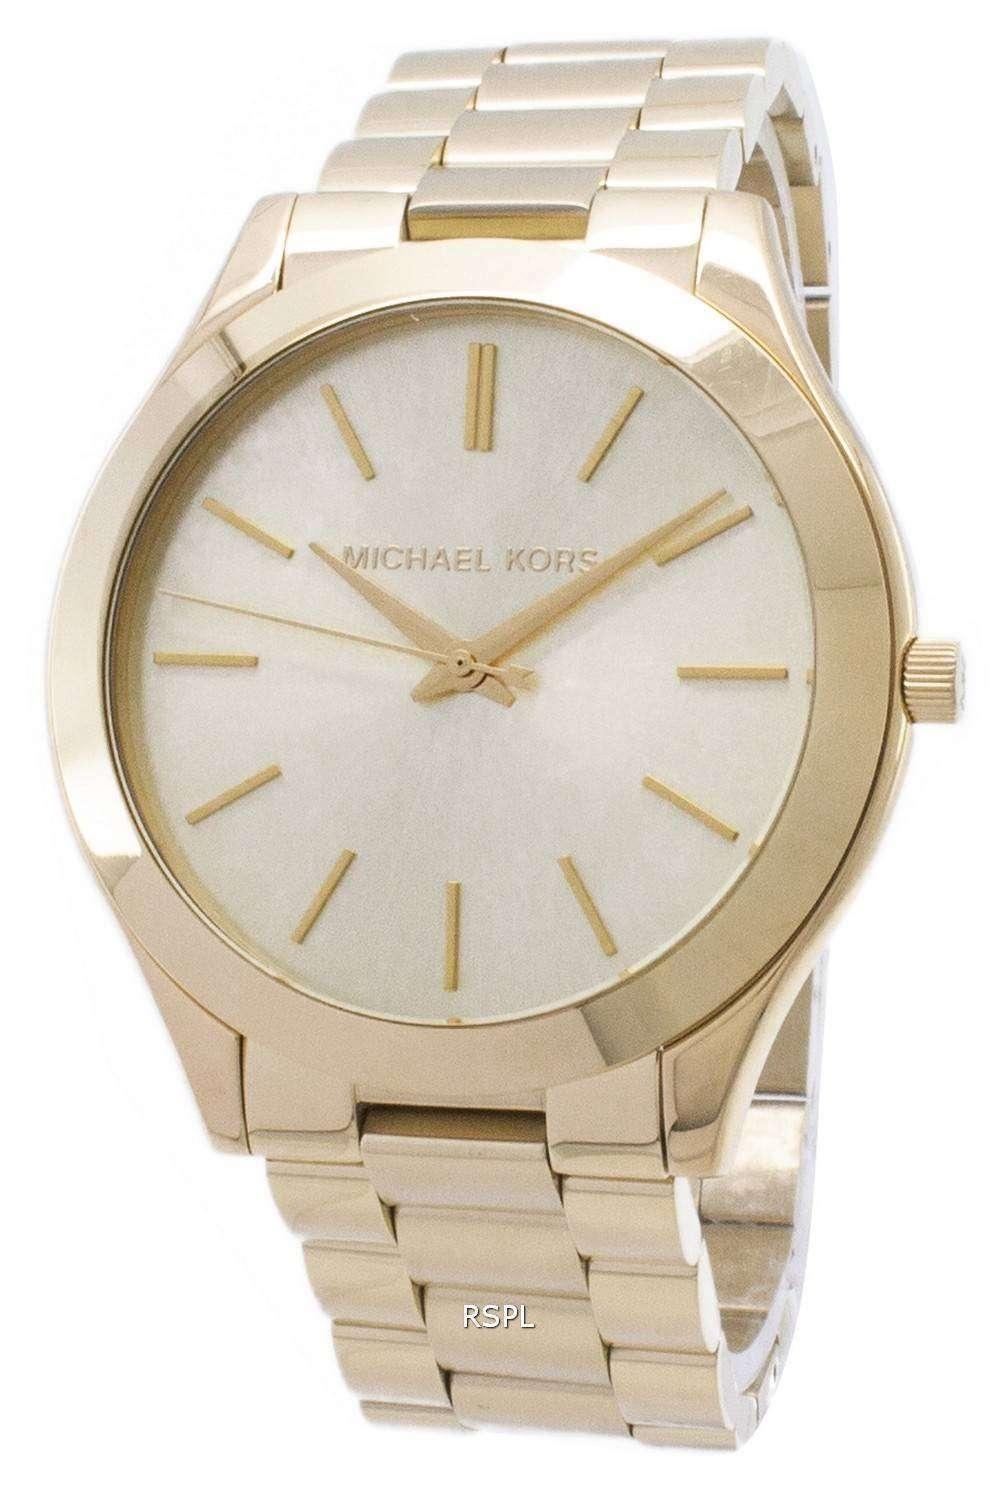 529fddeaada6 Michael Kors Runway Champagne Dial MK3179 Womens Watch - ZetaWatches